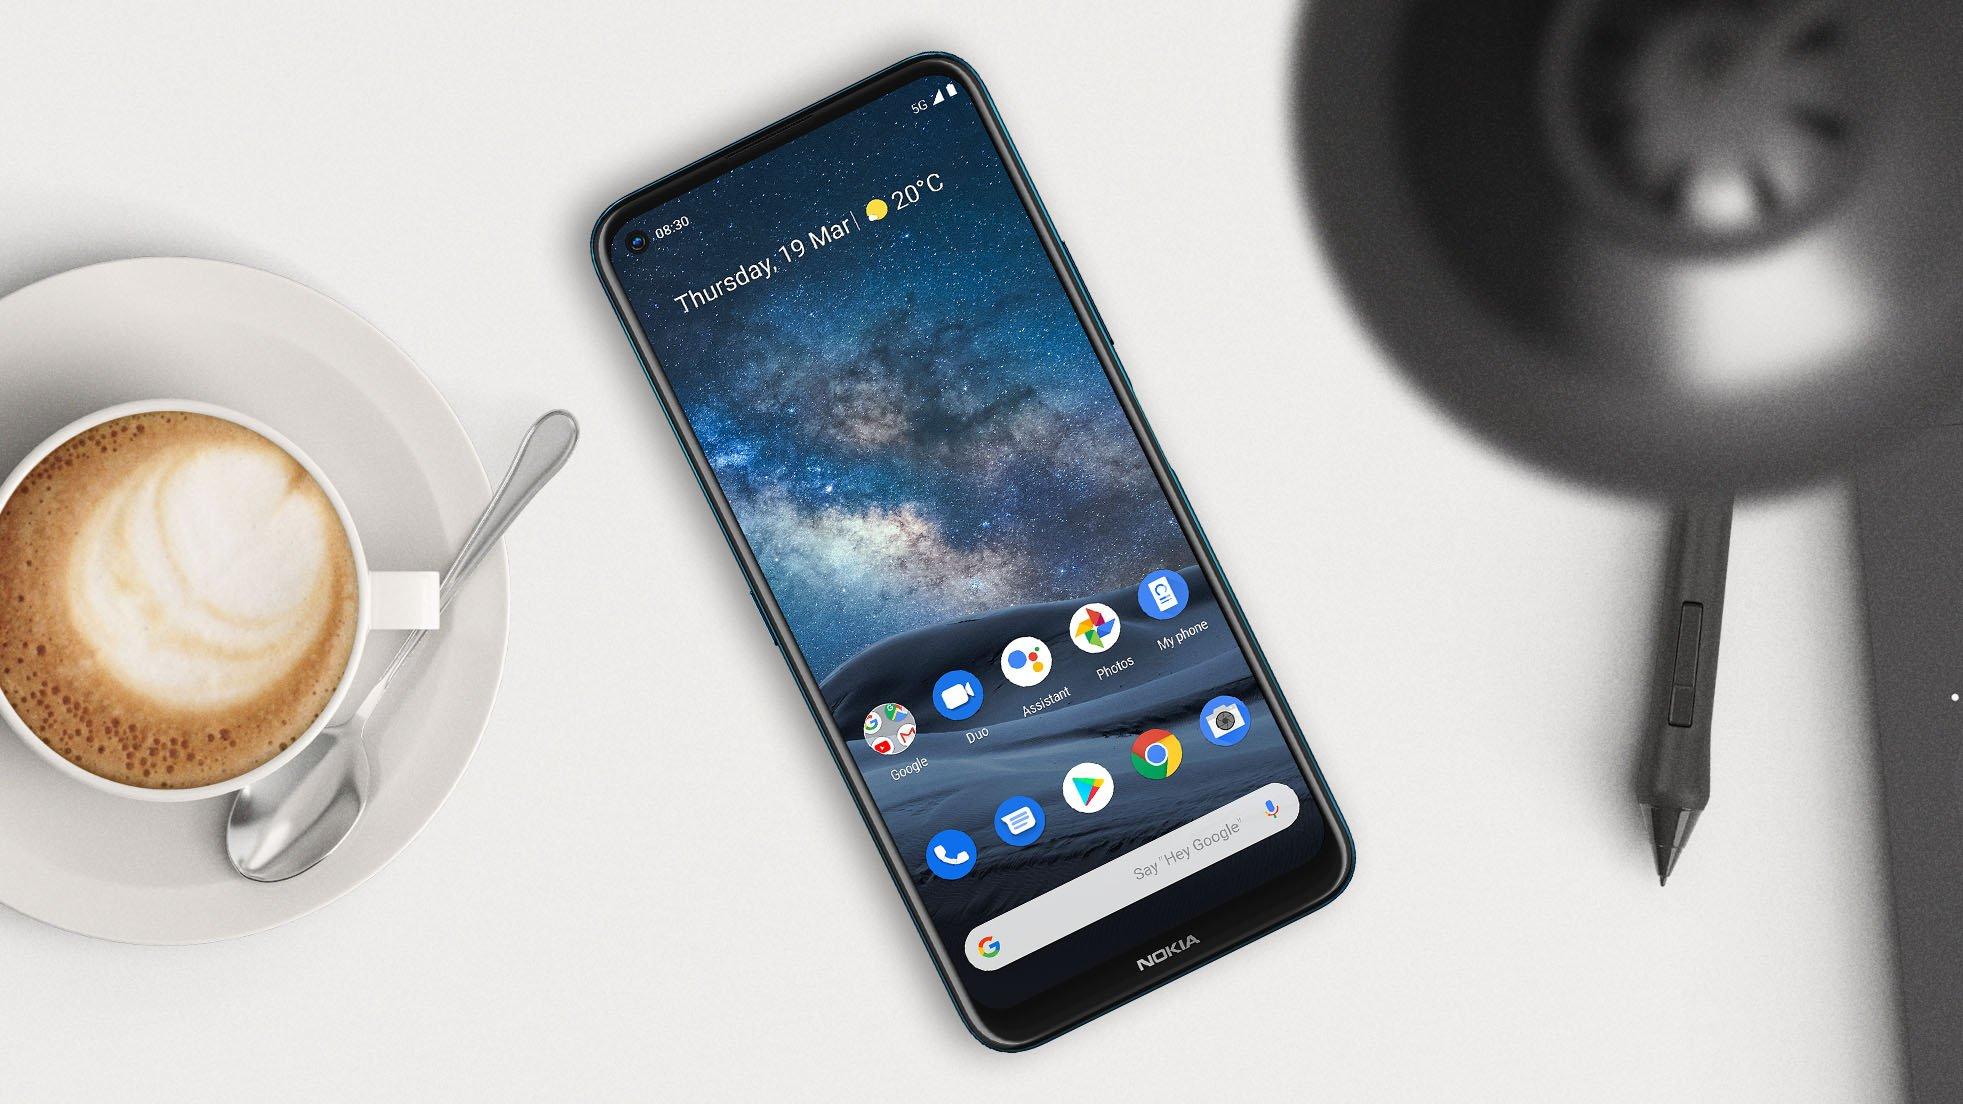 Chọn điện thoại 5G: Xiaomi Mi 10T Pro hay Nokia 8.3? 1